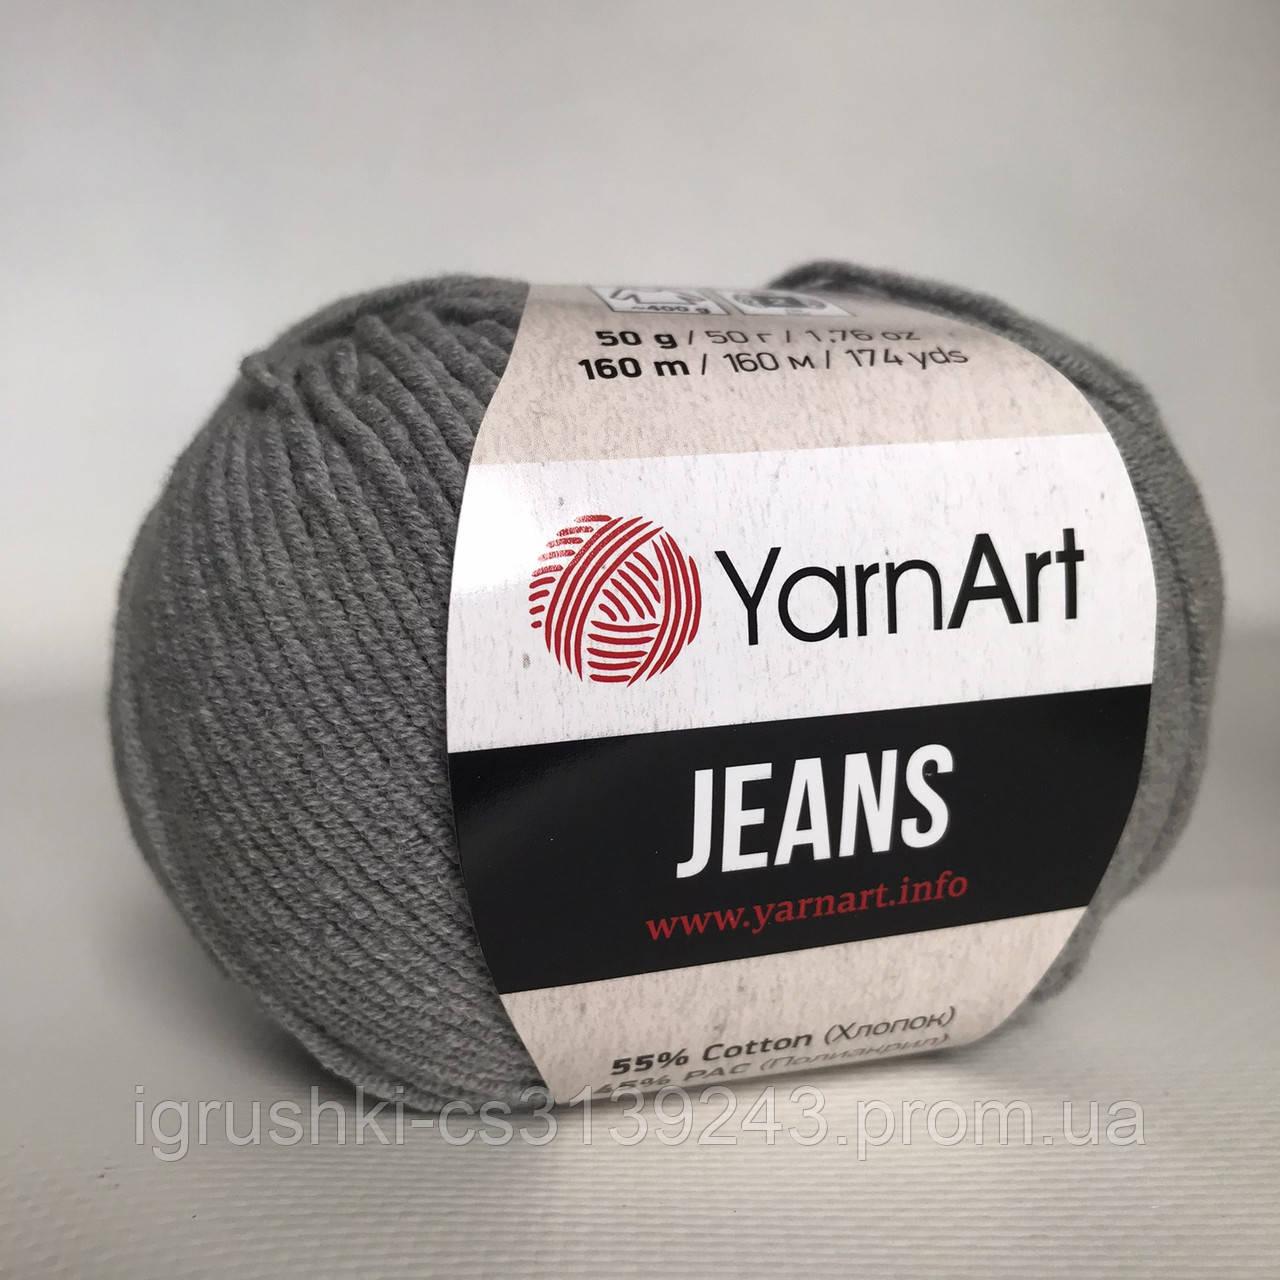 YarnArt Jeans (ярнарт джинс) 46 Серый